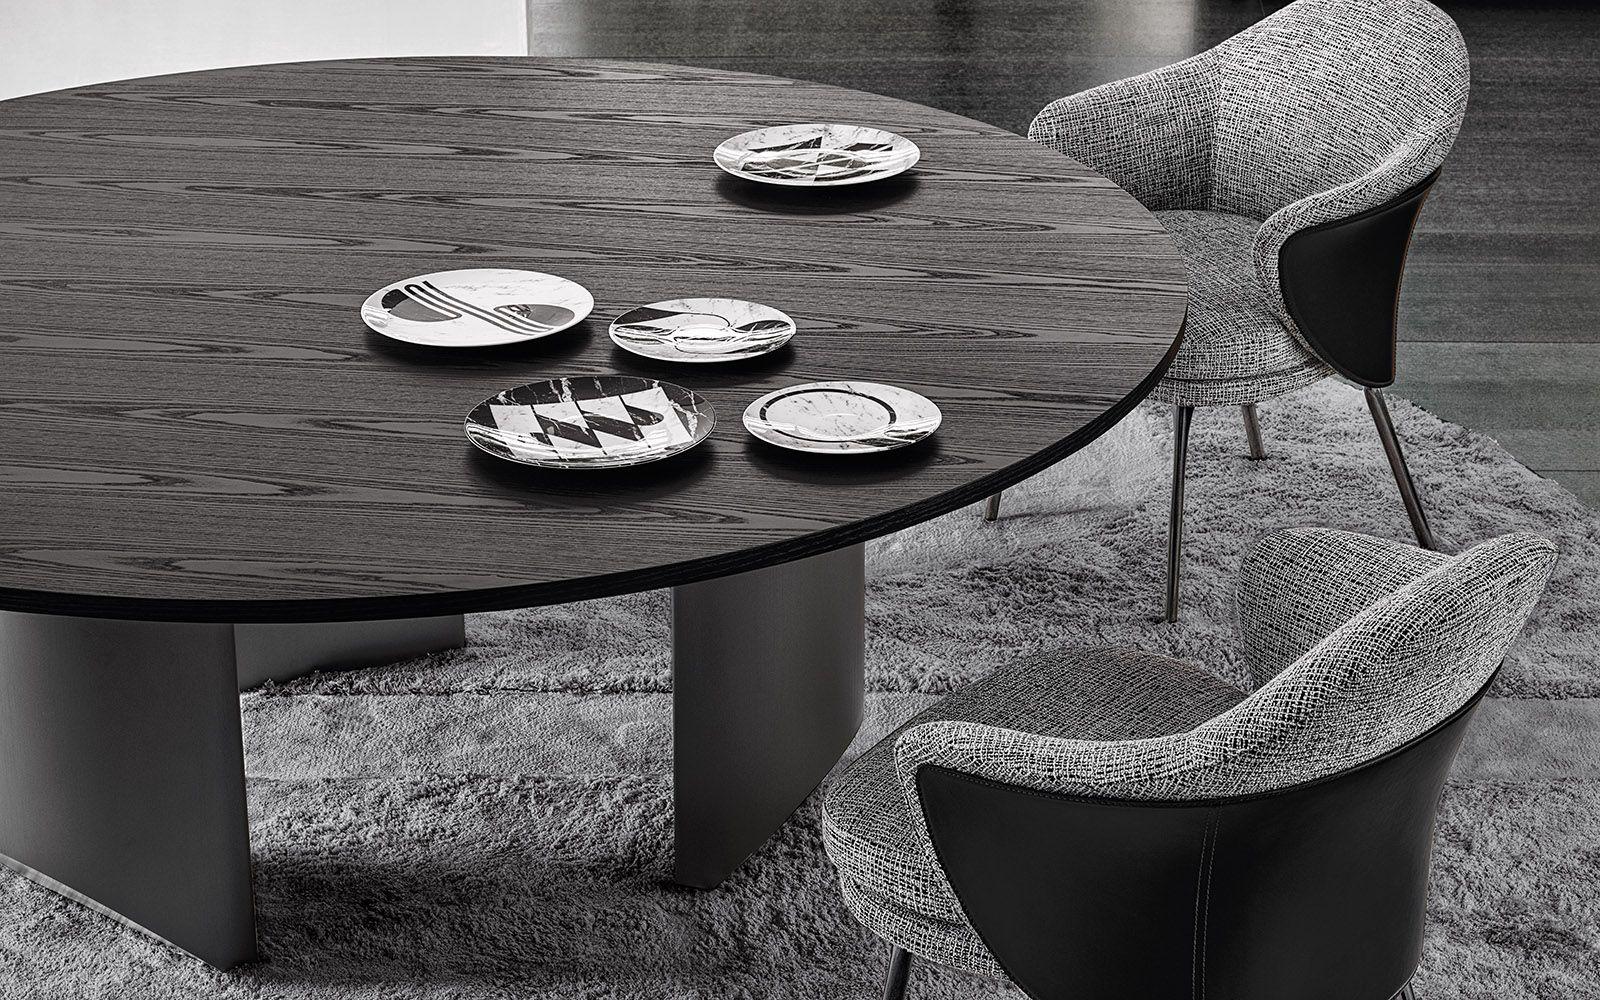 Wedge Dining Table Nendo Design Angie Dining Chair Gamfratesi Design Minotti Nendo Table Wedge Gamfratesi Nendo Design Dining Table Table